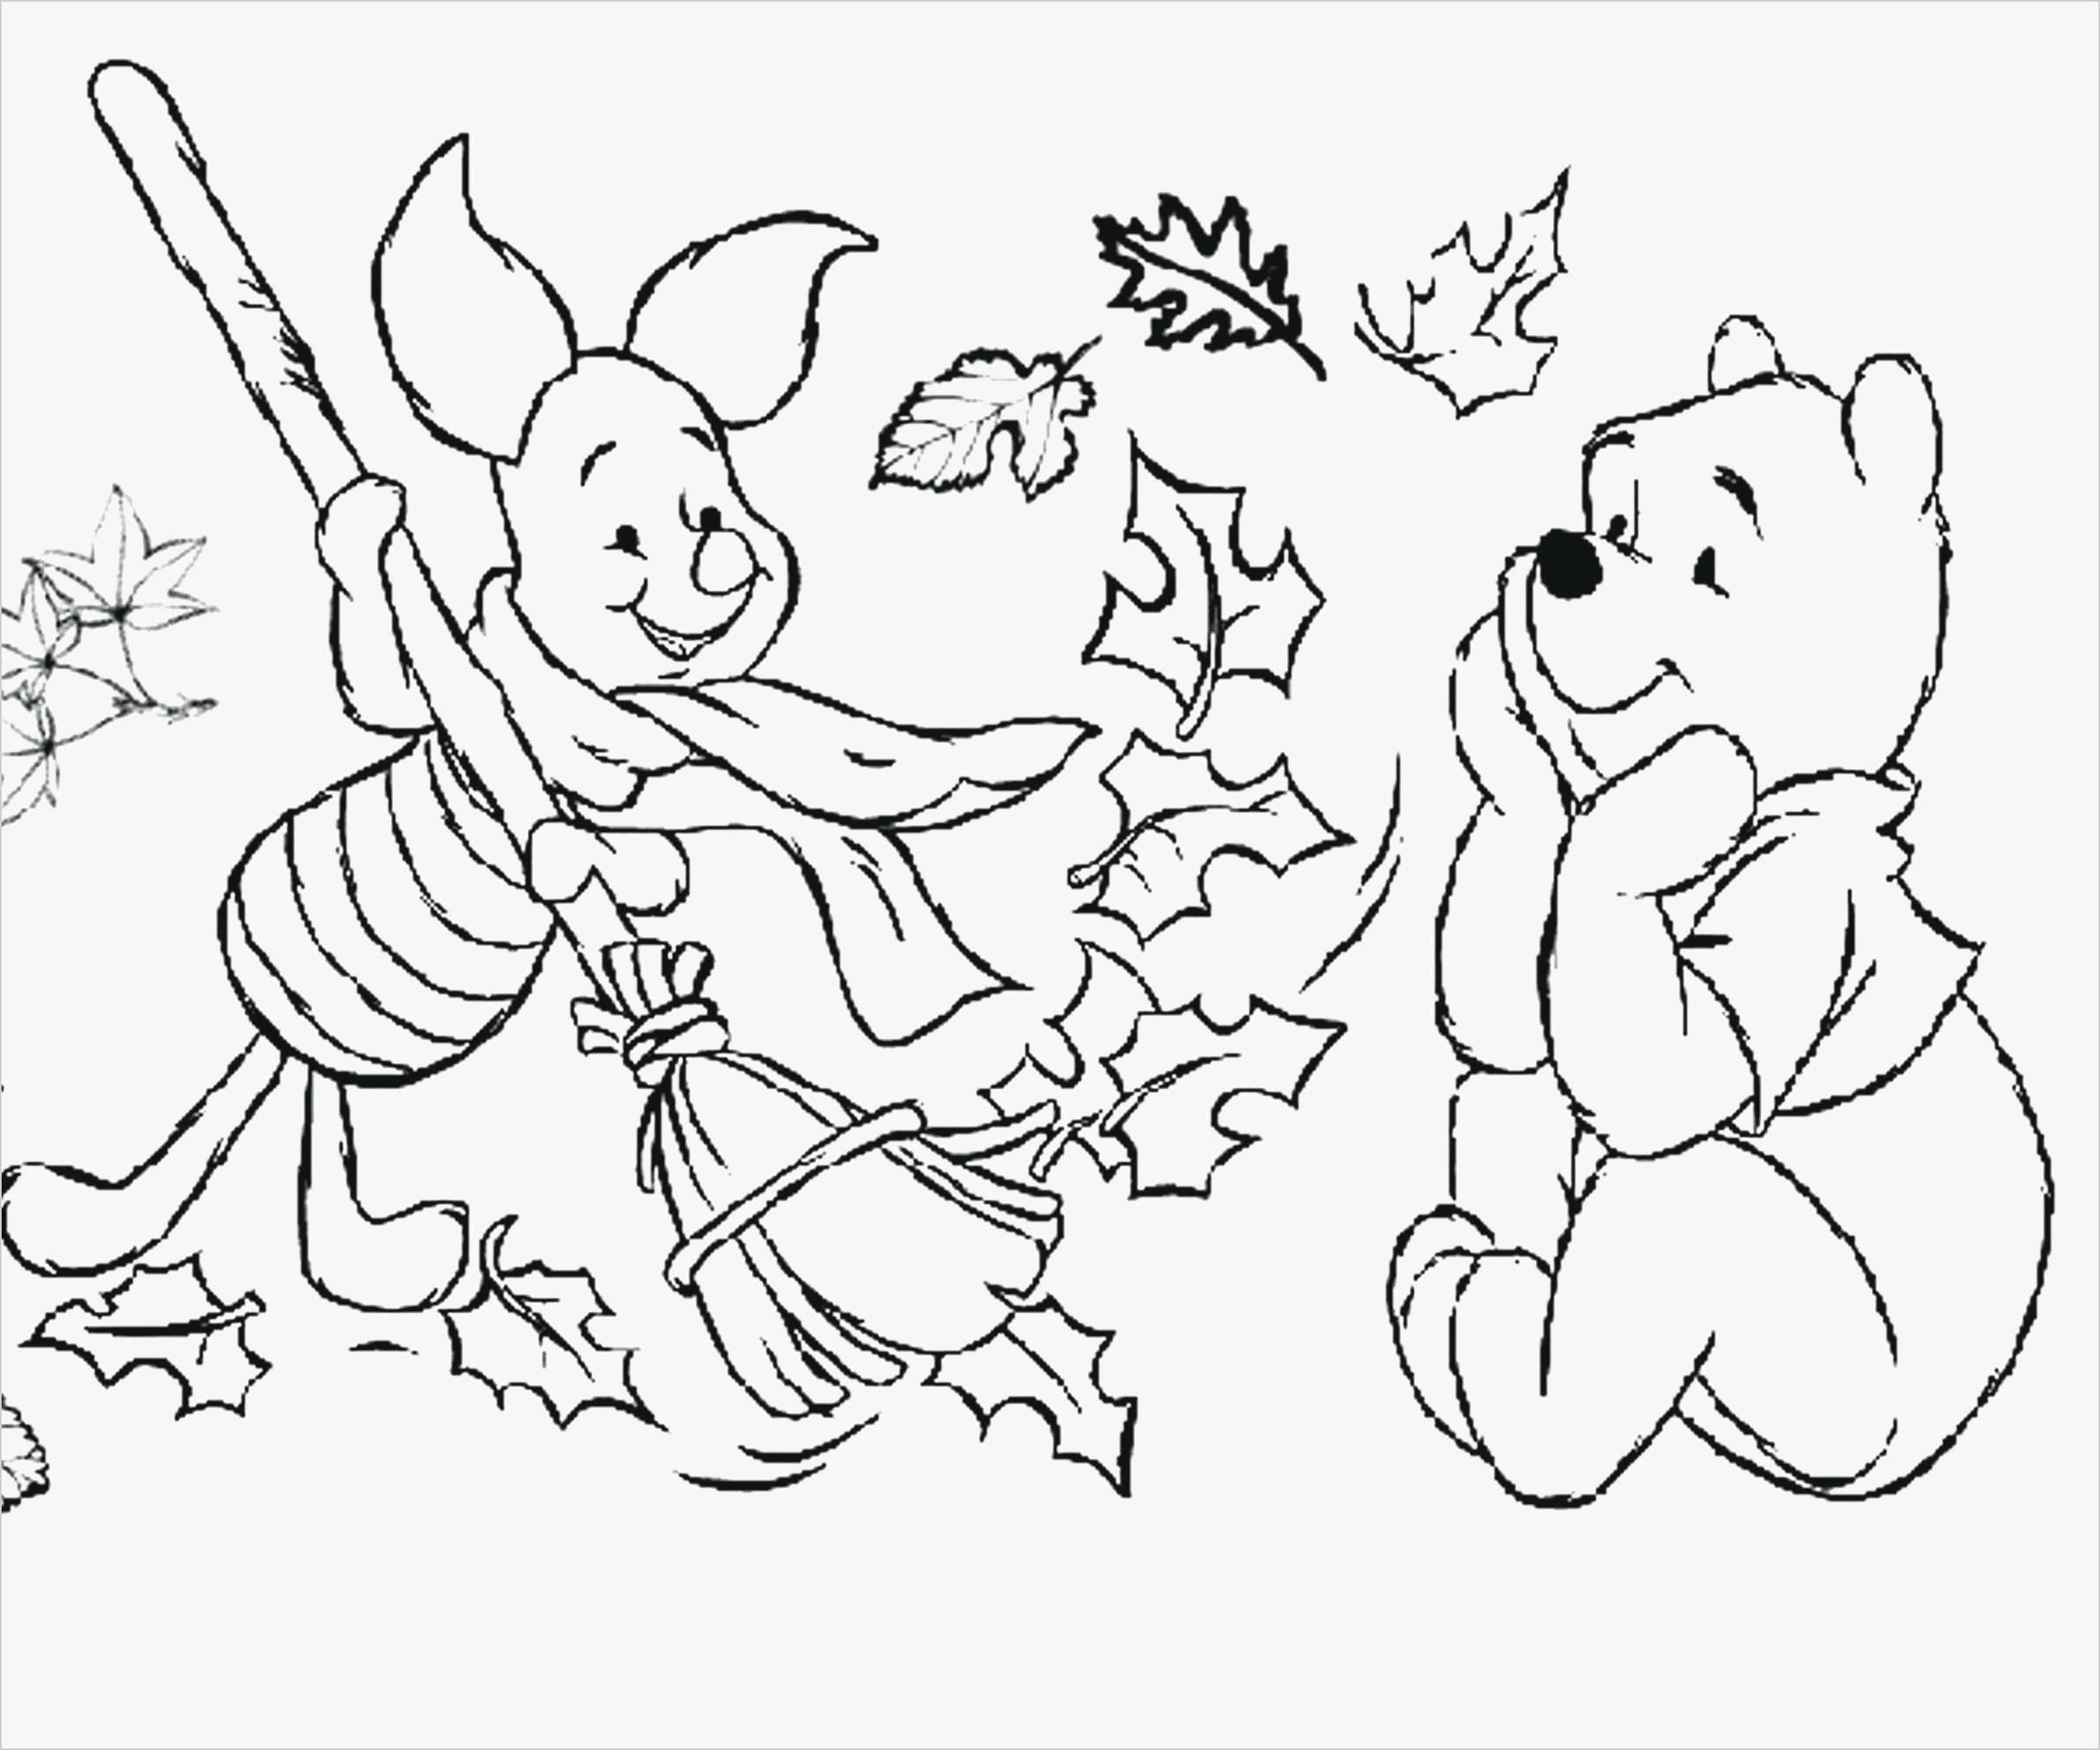 Ausmalbilder Pokemon Xy Inspirierend Charizard Coloring Page Fotos